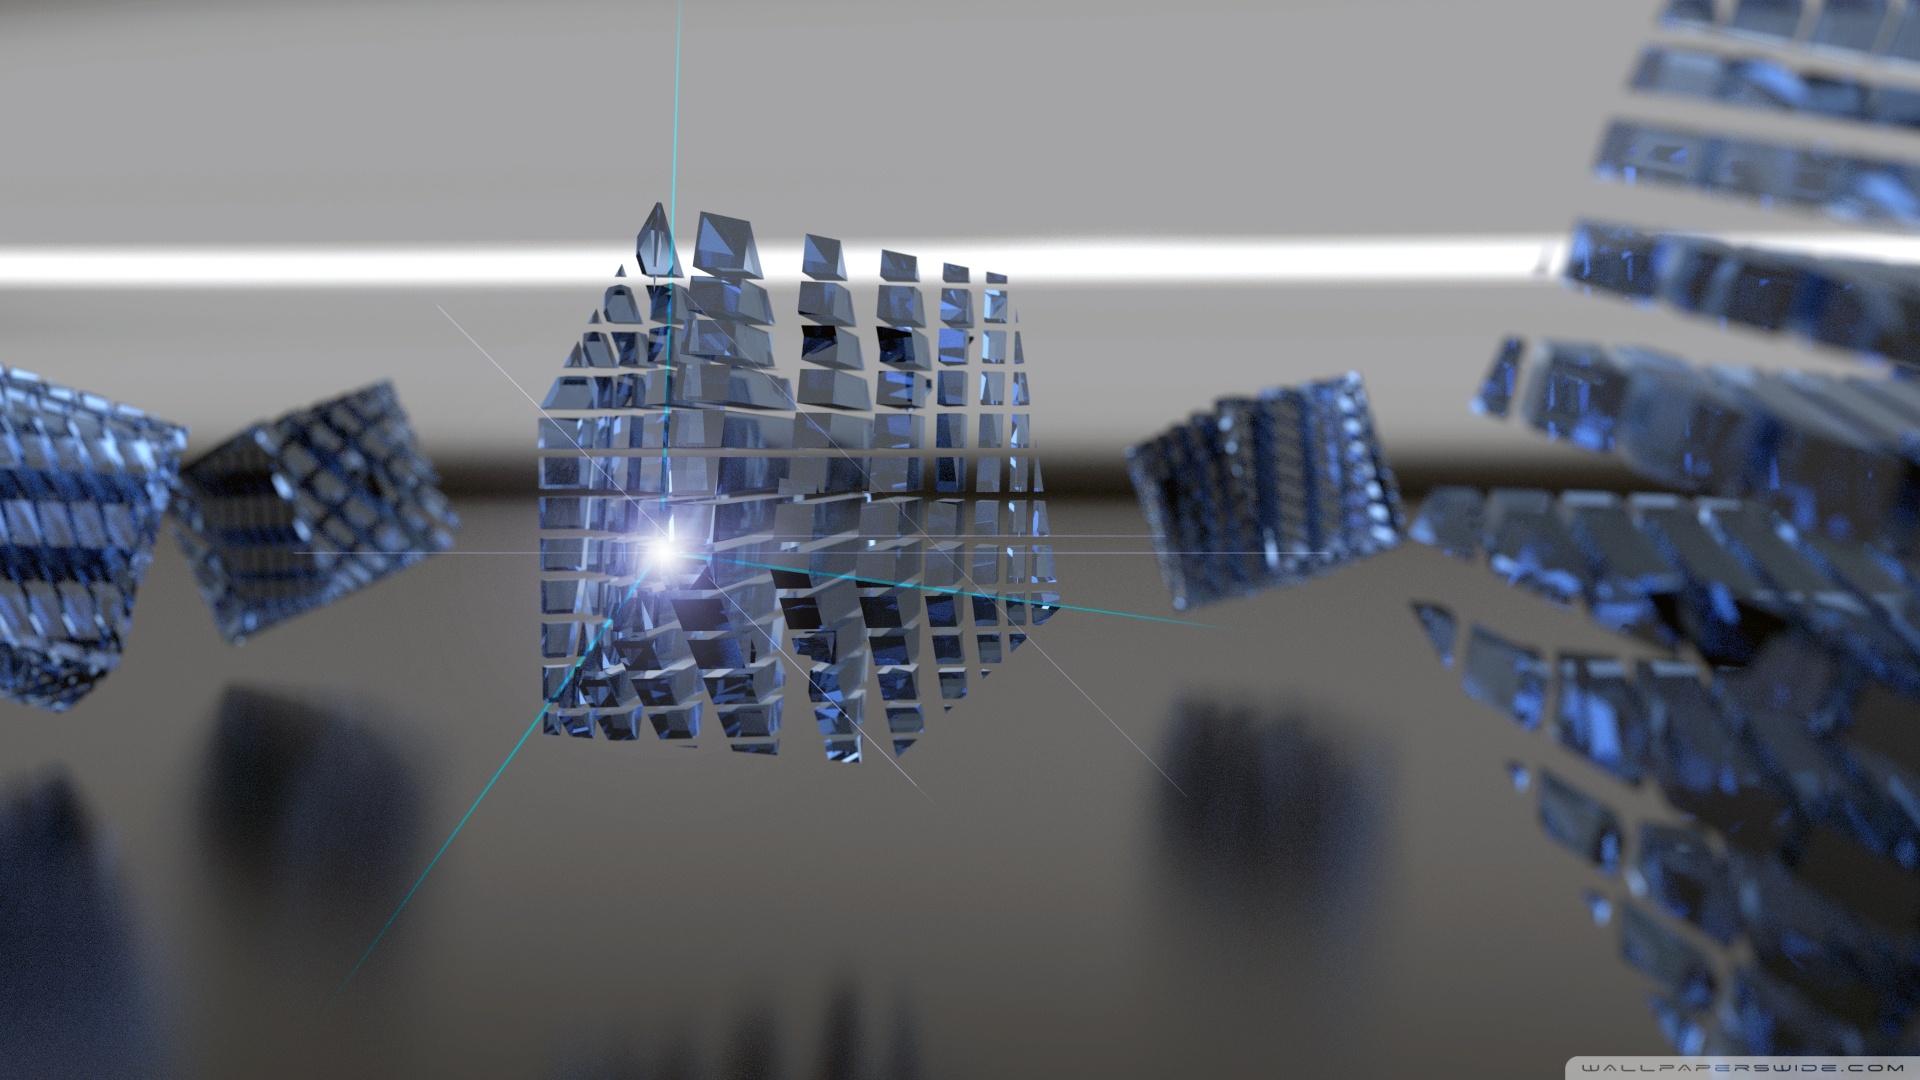 3d Optical Illusion Hd Wallpaper Cube Of Illusion 4k Hd Desktop Wallpaper For 4k Ultra Hd